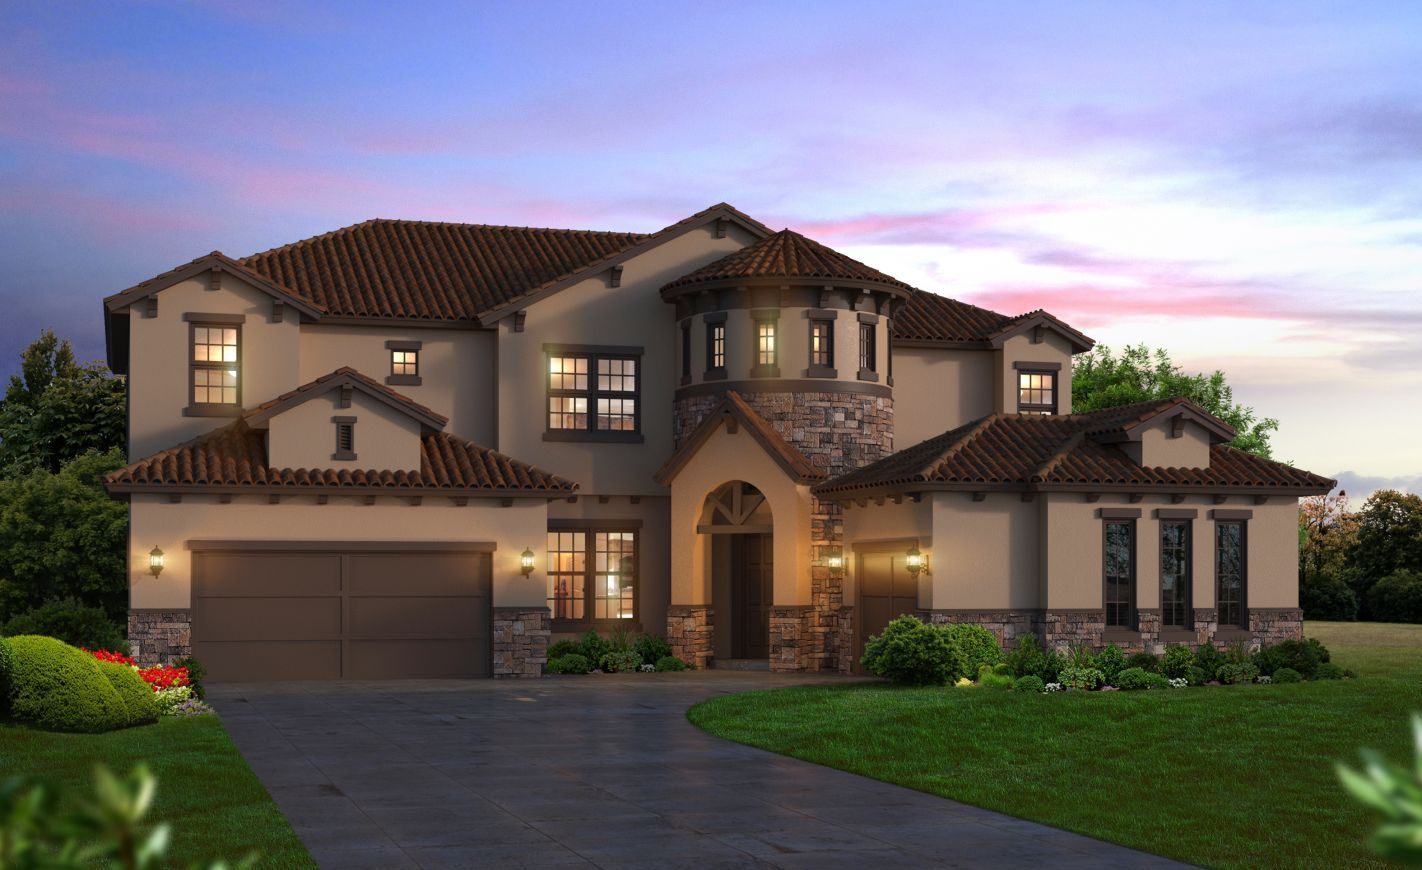 ici homes grand hampton brooke 1143292 tampa fl new home for sale homegain